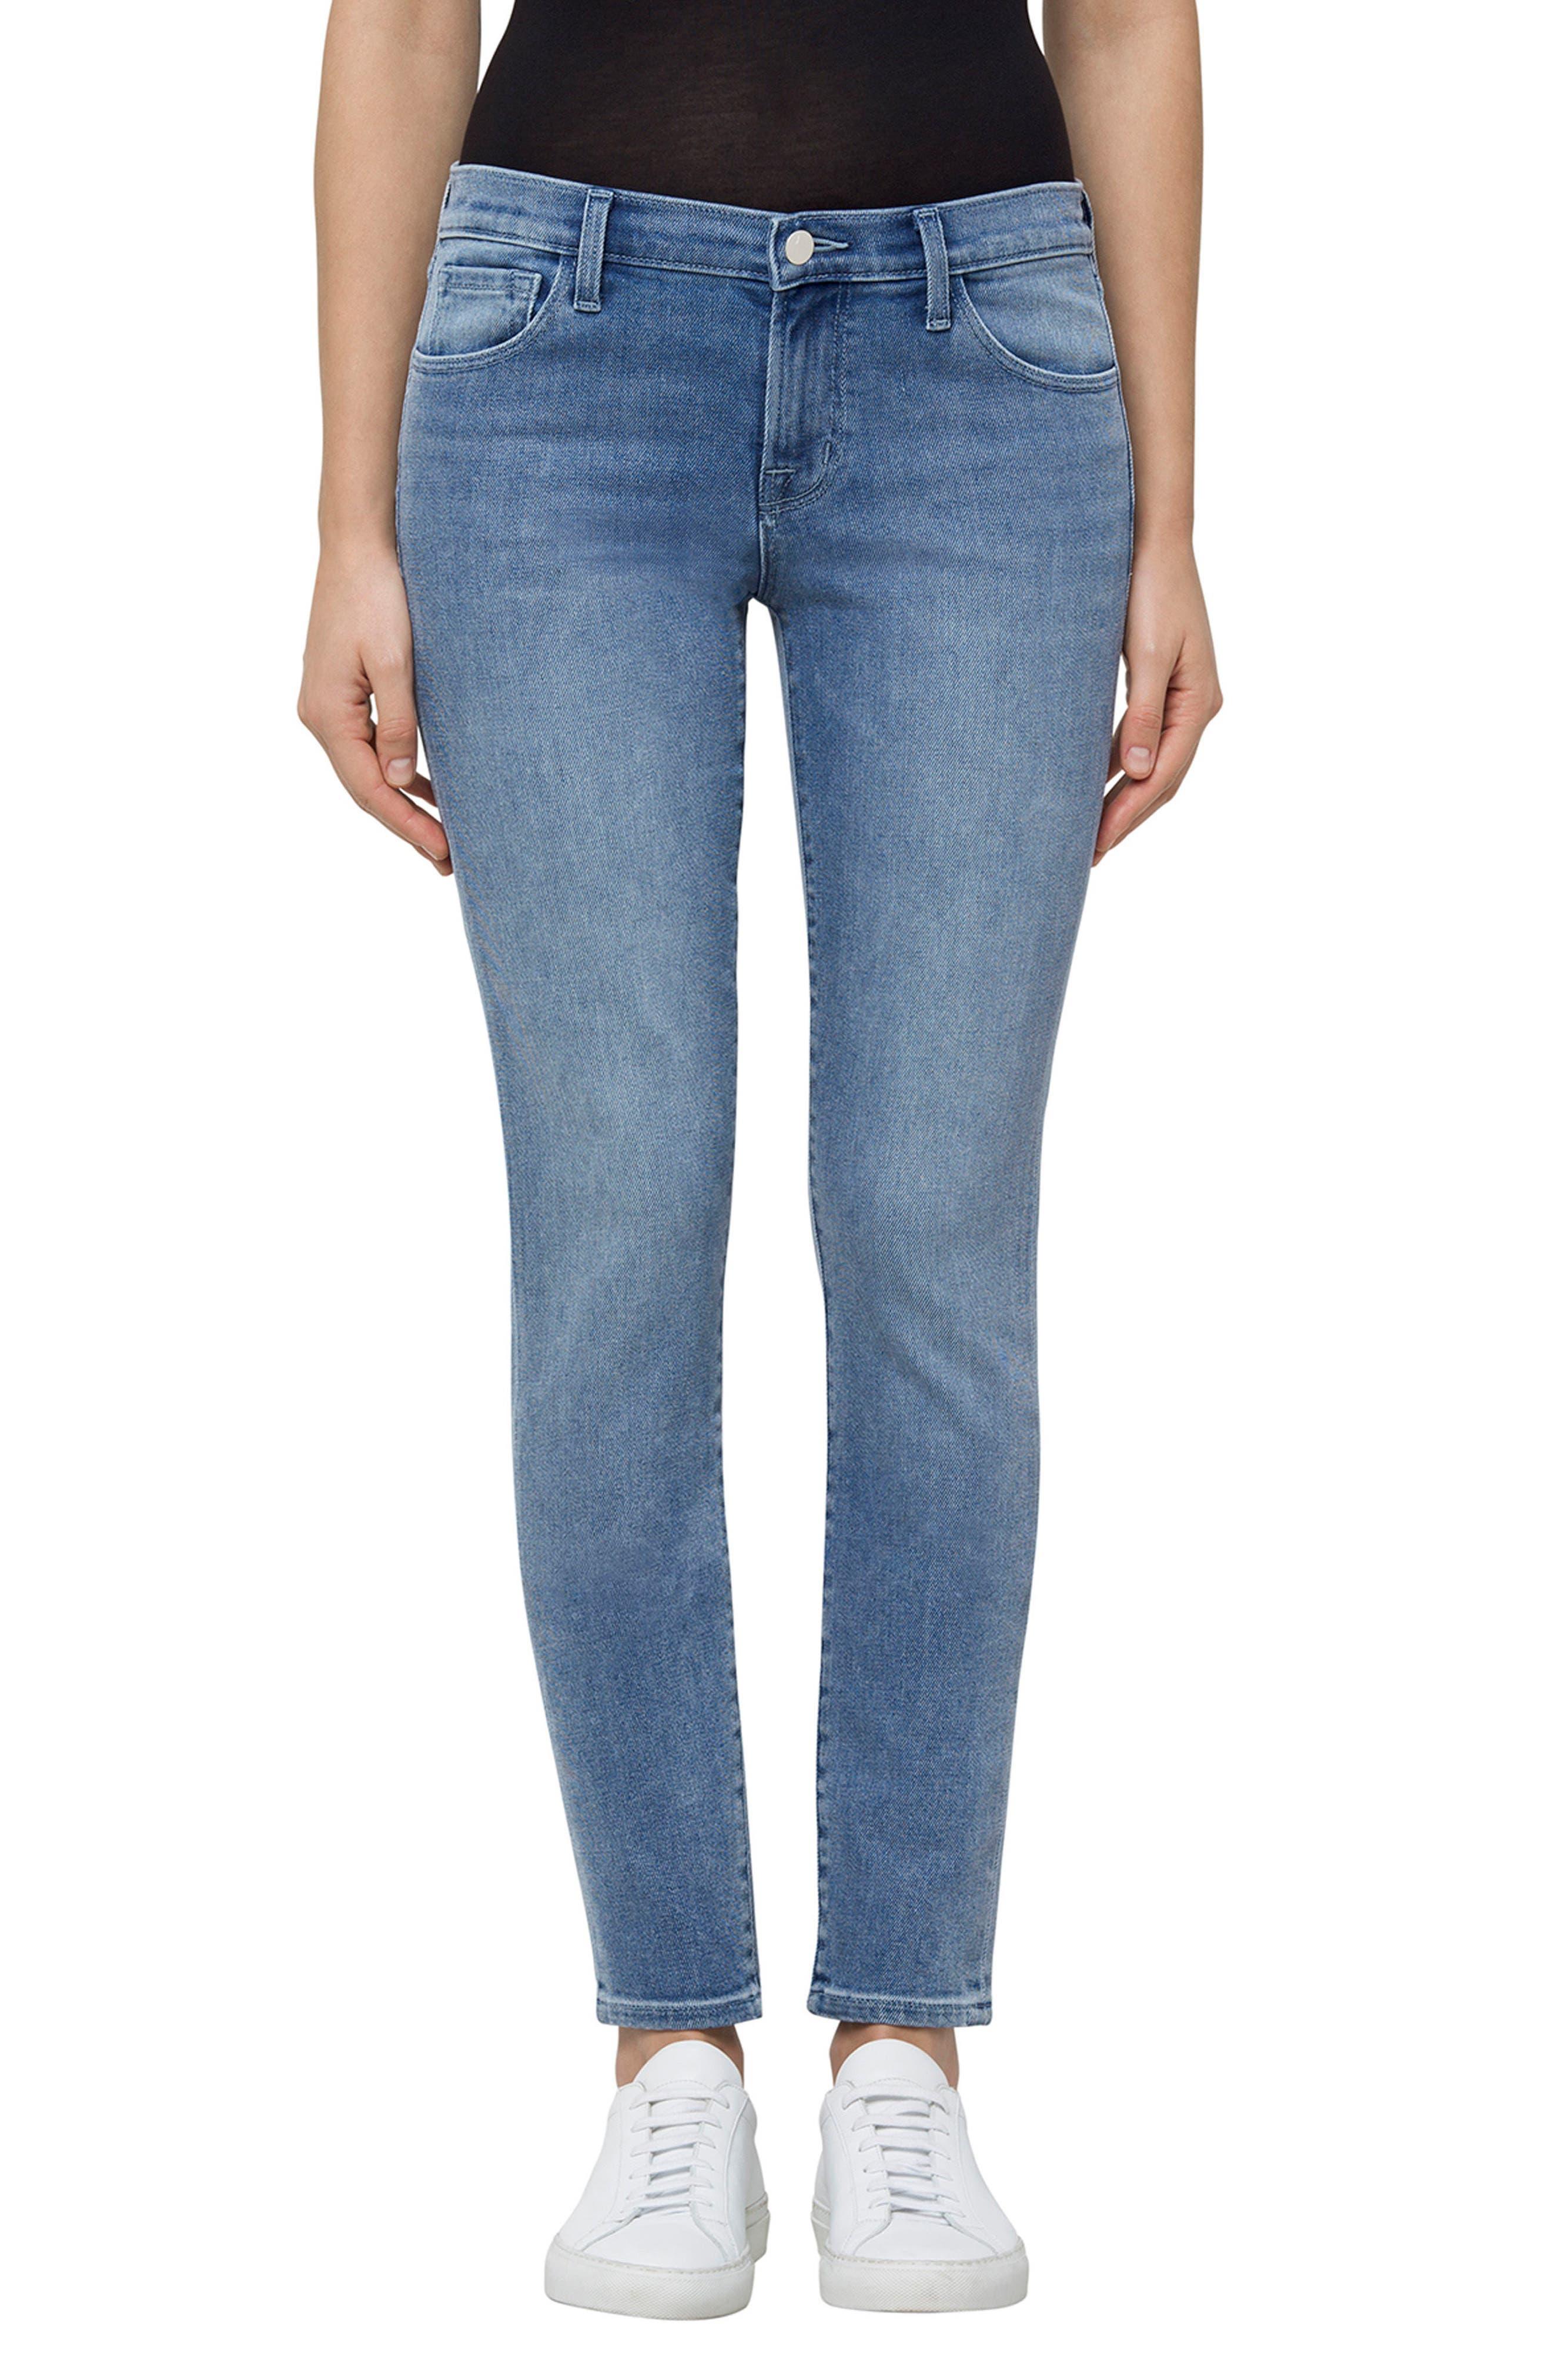 811 Skinny Jeans,                         Main,                         color, Utopia